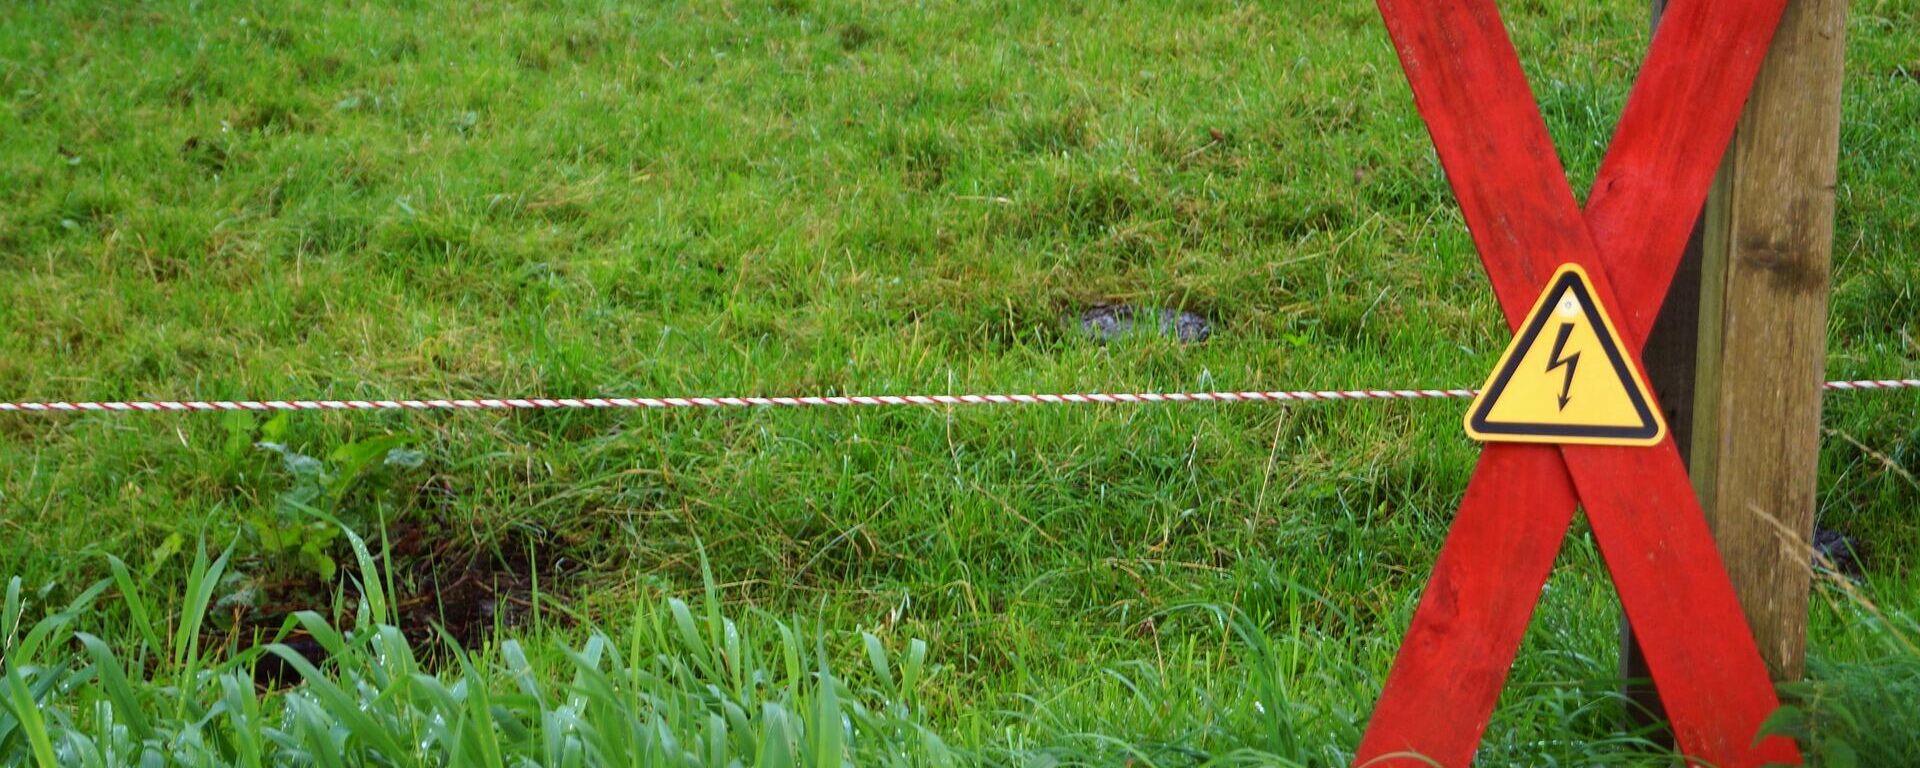 Una cerca eléctrica. Imagen referencial - Sputnik Mundo, 1920, 19.04.2021